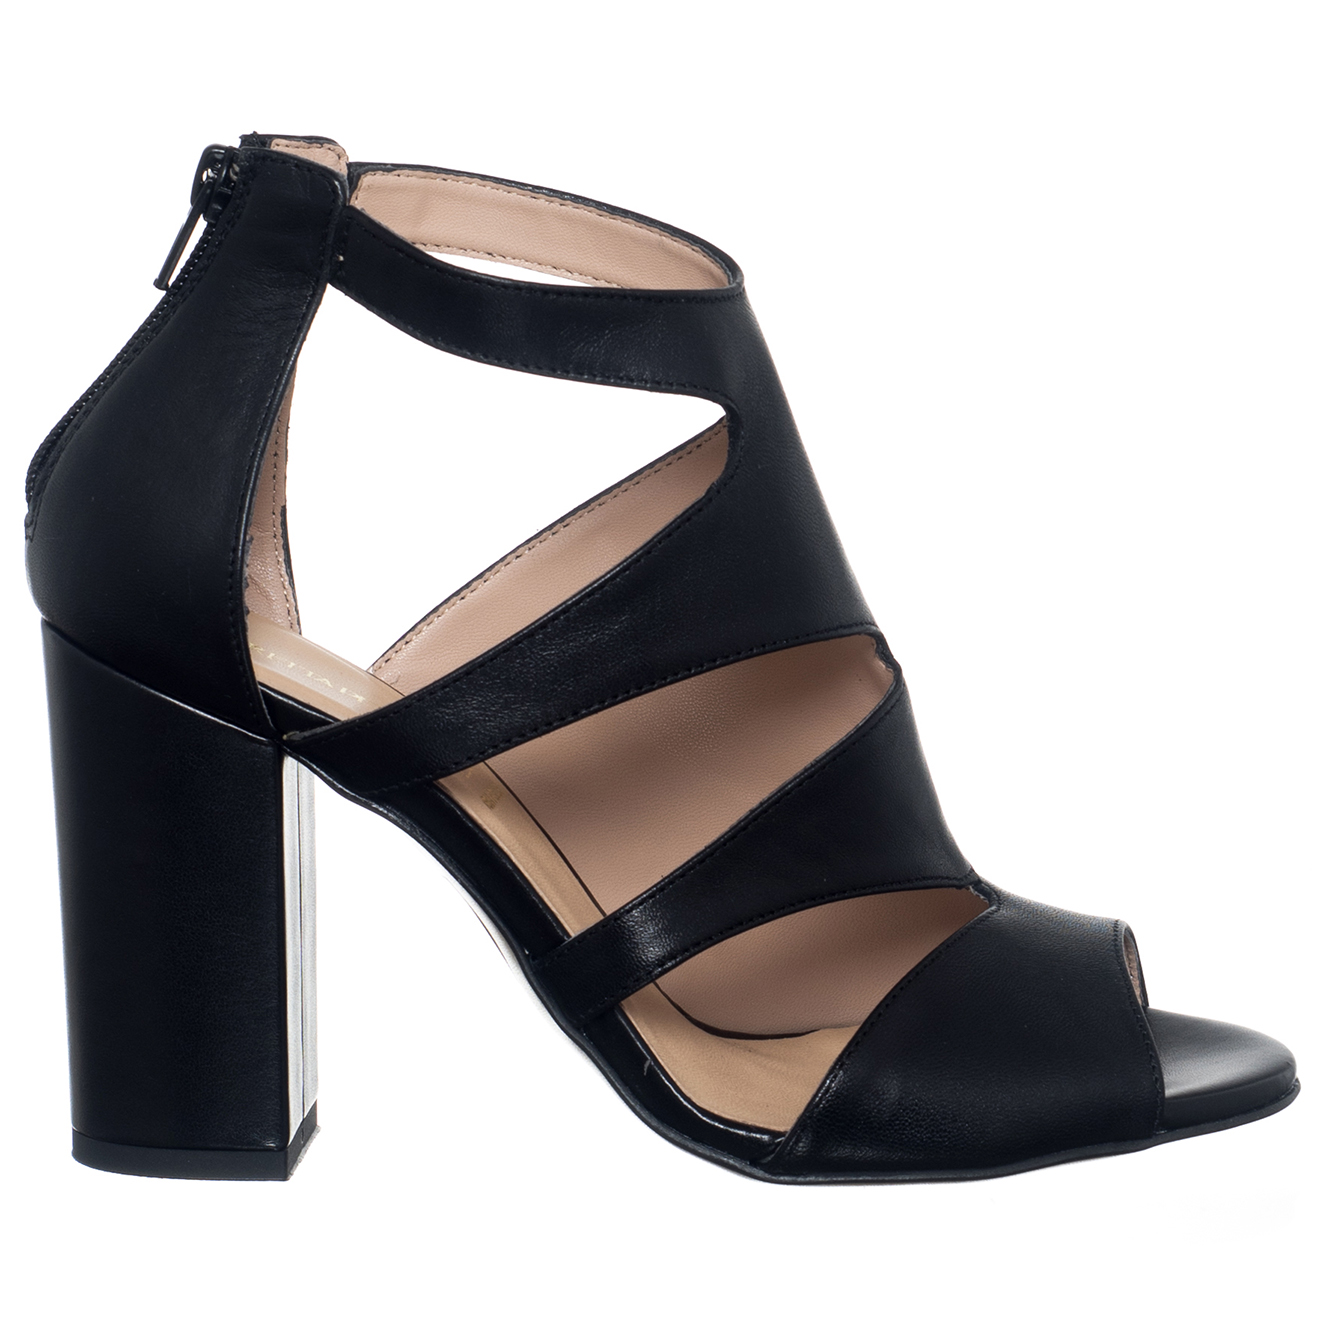 Sandales en Cuir Aurore noires - Talon 9 cm - Loretta Pettinari - Modalova